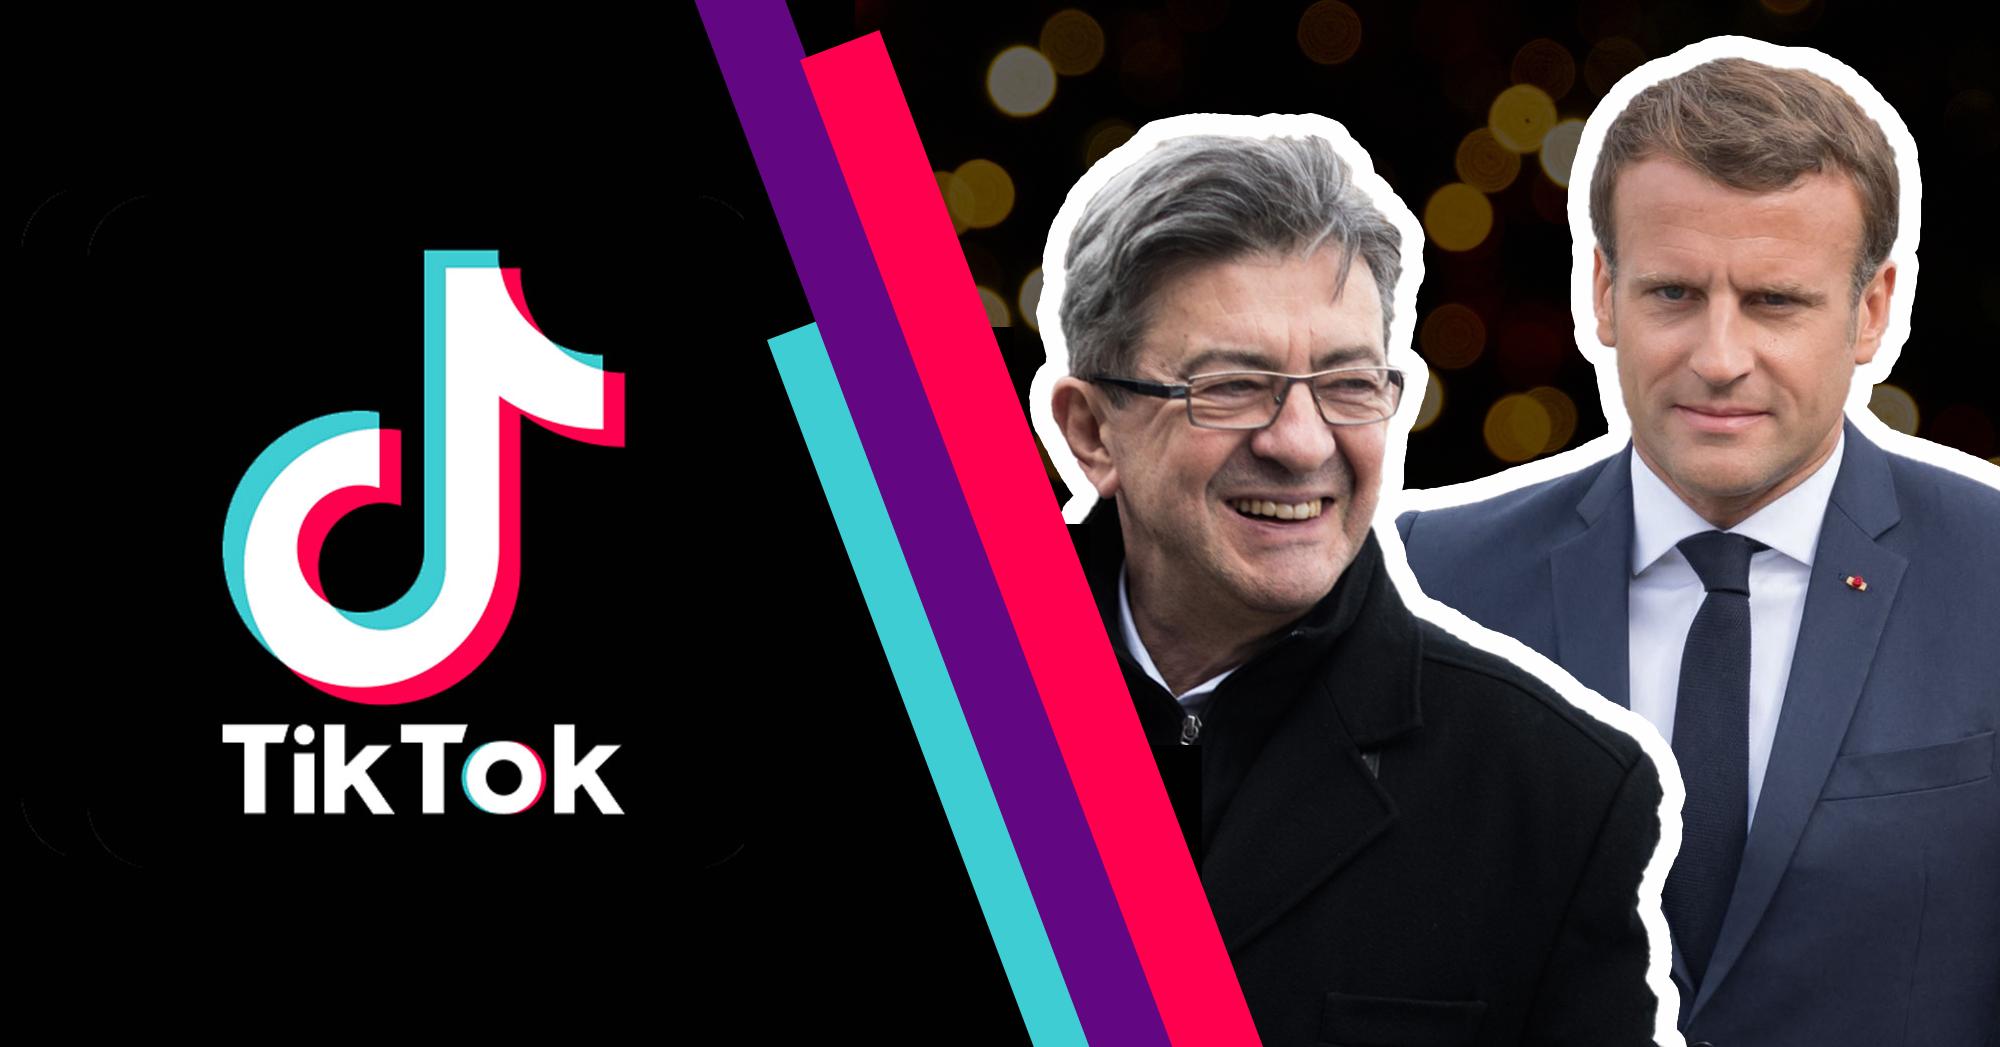 TikTok - Mélenchon Macron